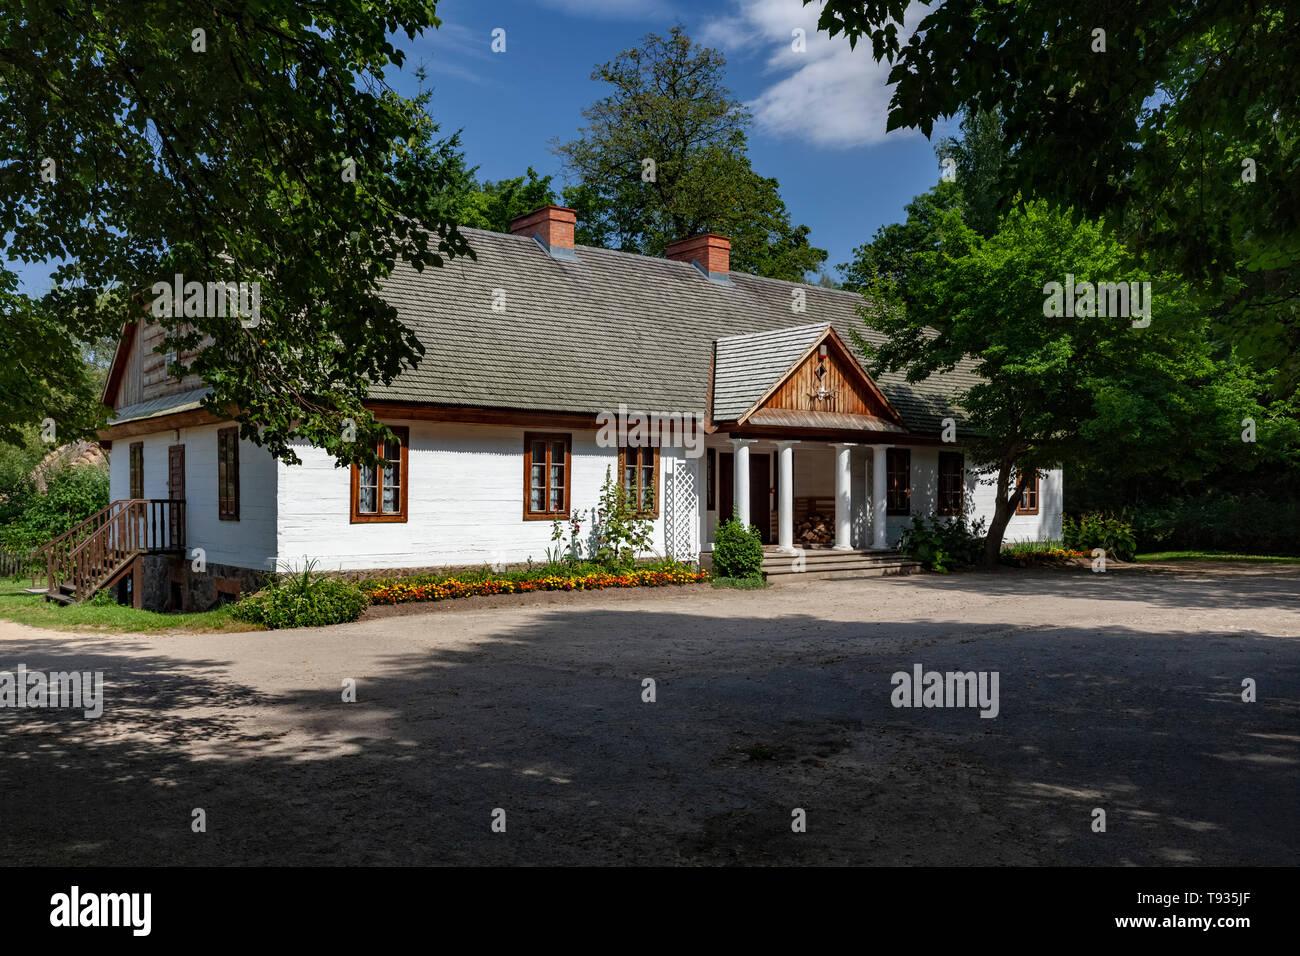 Ciechanowiec open-air museum, larch manor house, Podlasie, Poland, Europe - Stock Image